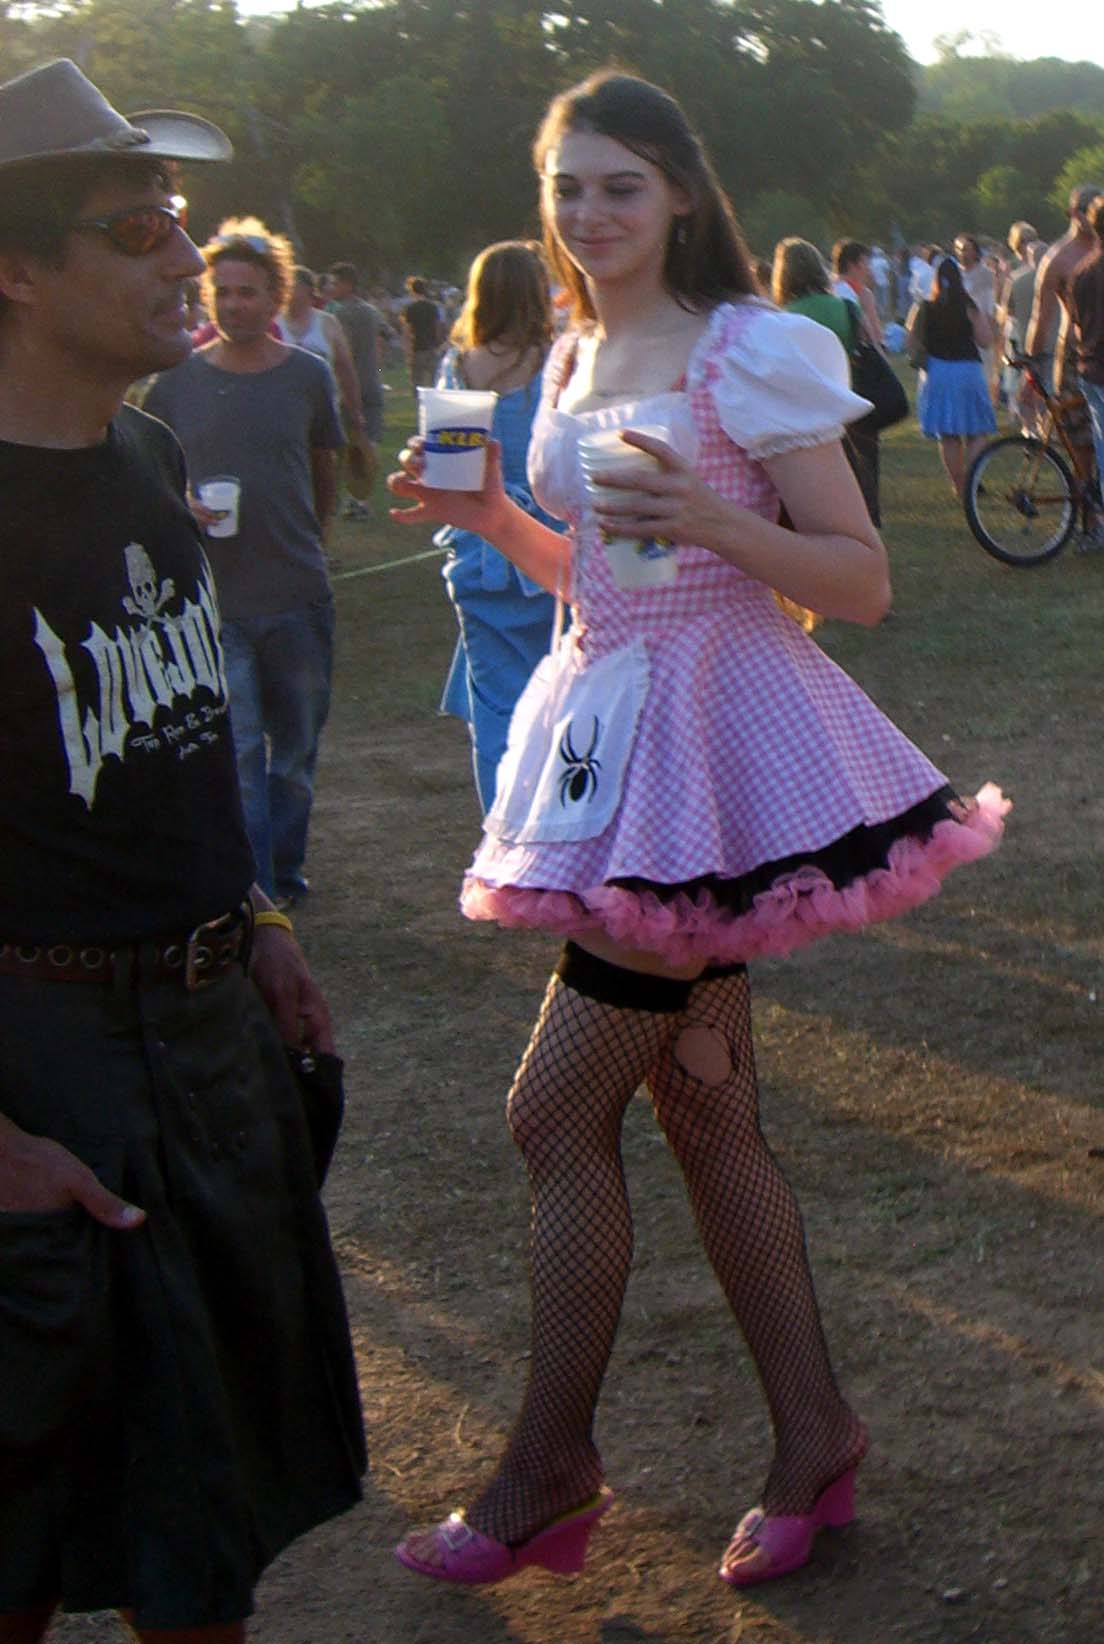 Pink and white gingham and ruffle dress, Eeyore's Birthday 2007